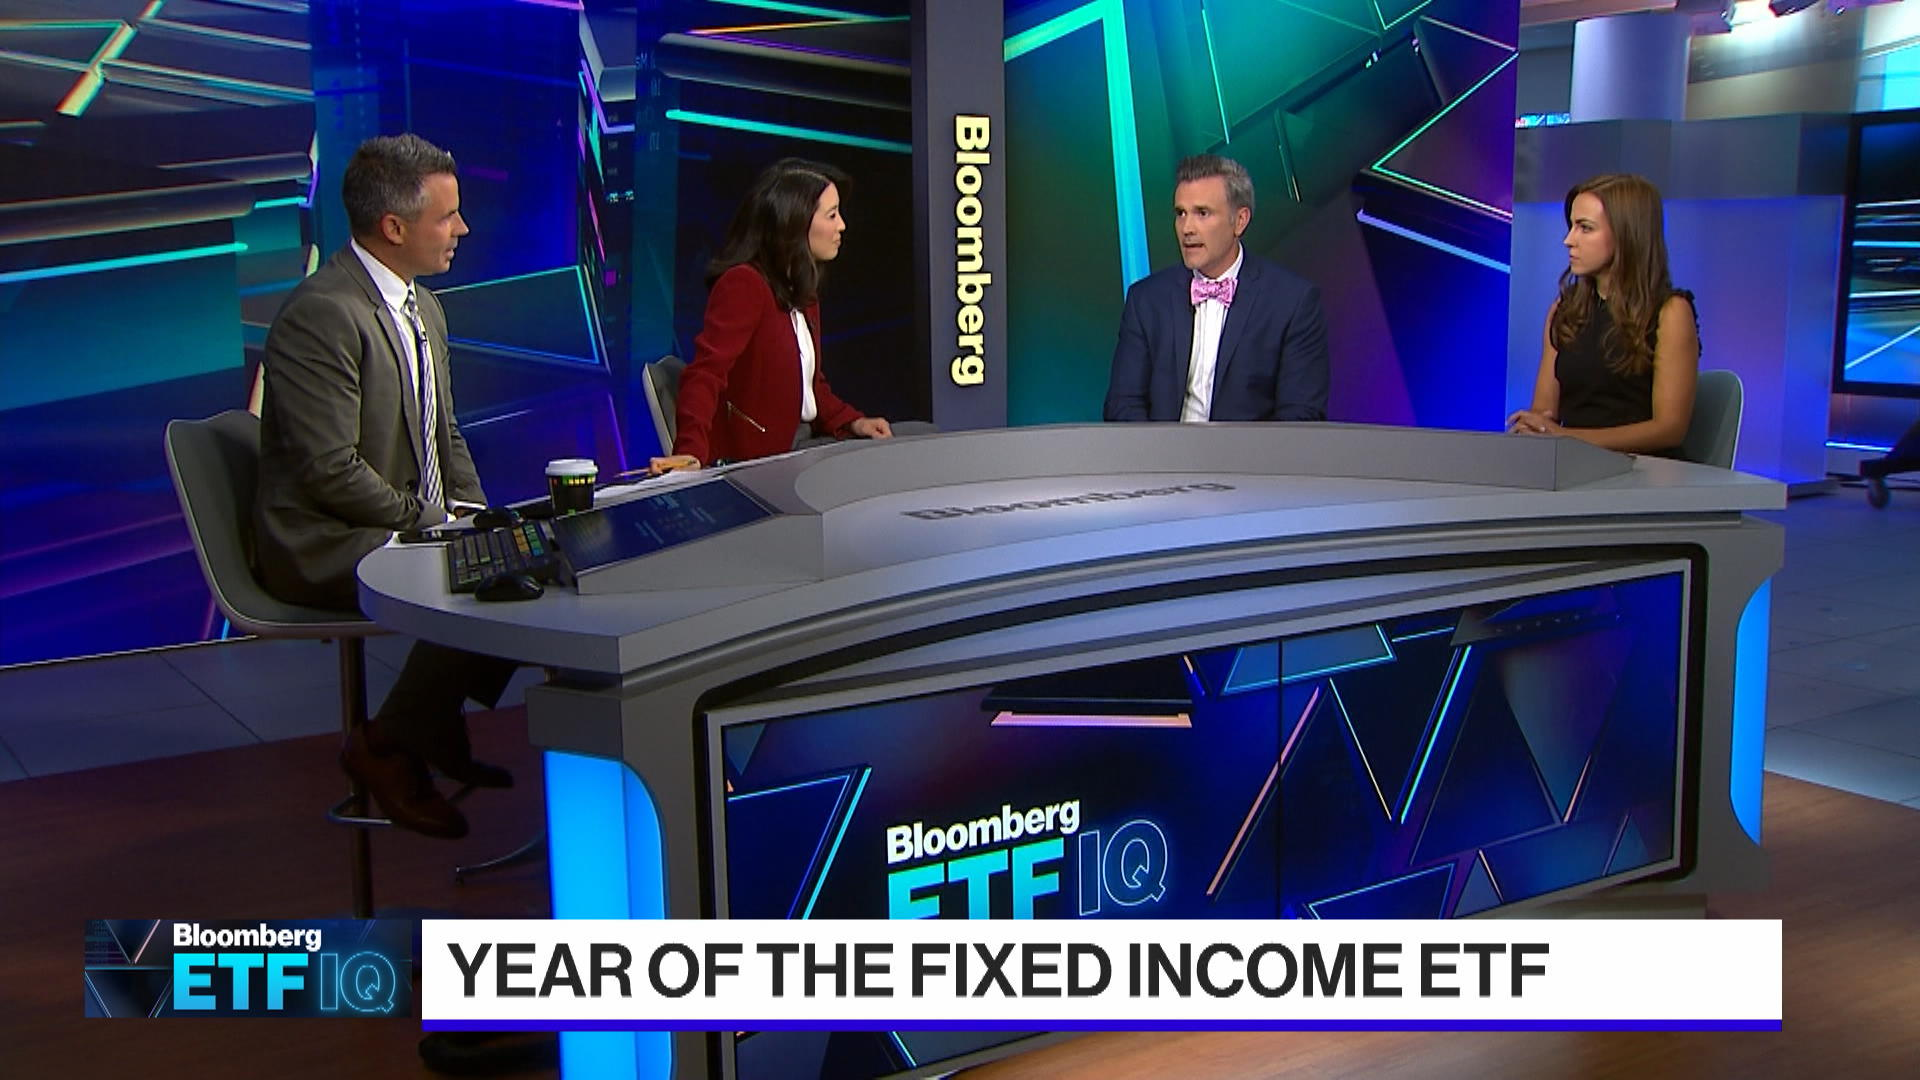 Burry Compares Index Funds to Subprime CDOs, Should Investors Worry?